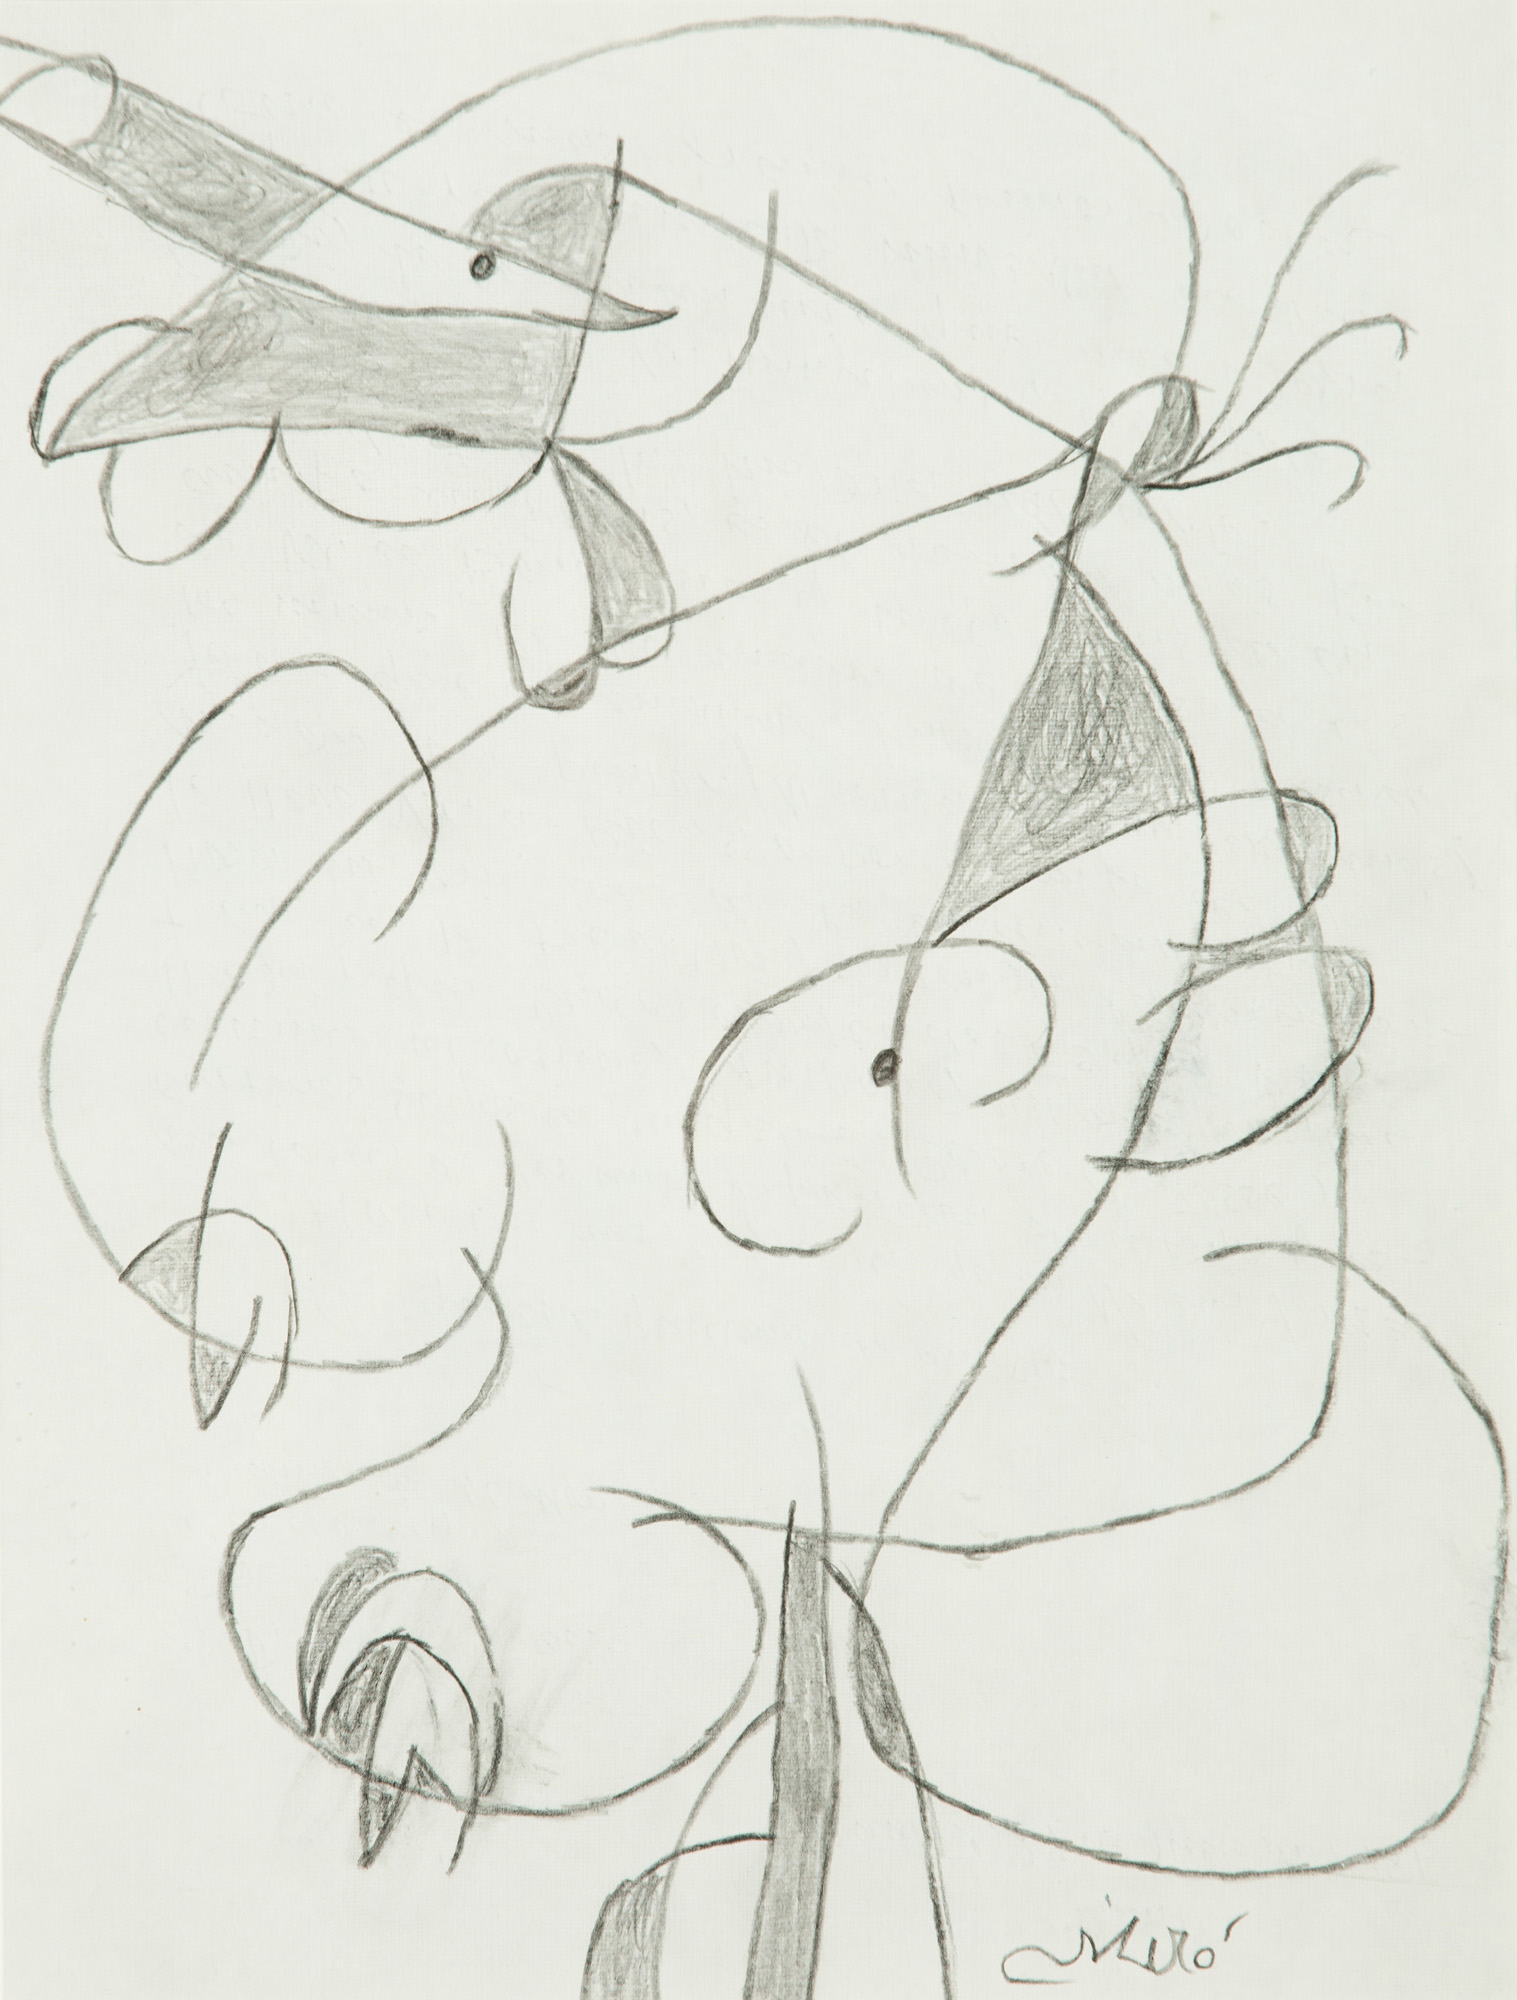 Joan Miró. Femme, 1981. Salida: 9.750 euros. Remate: 18.000 euros